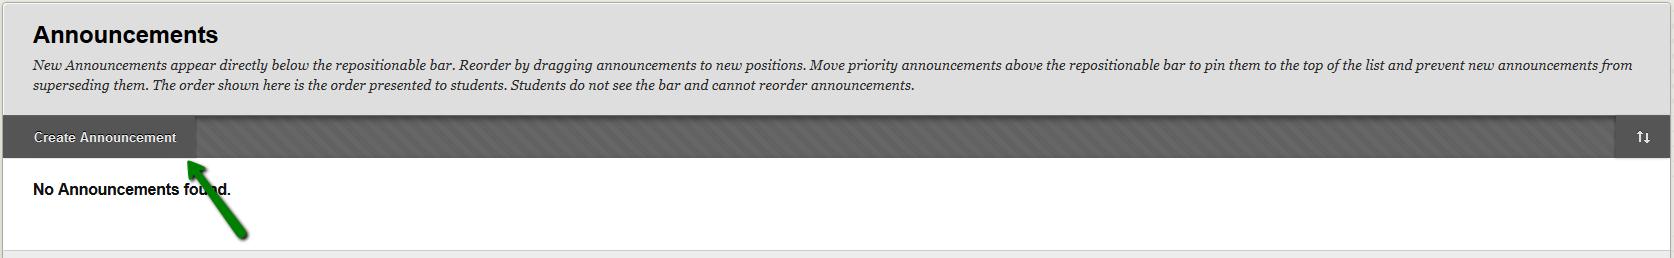 create_announcement